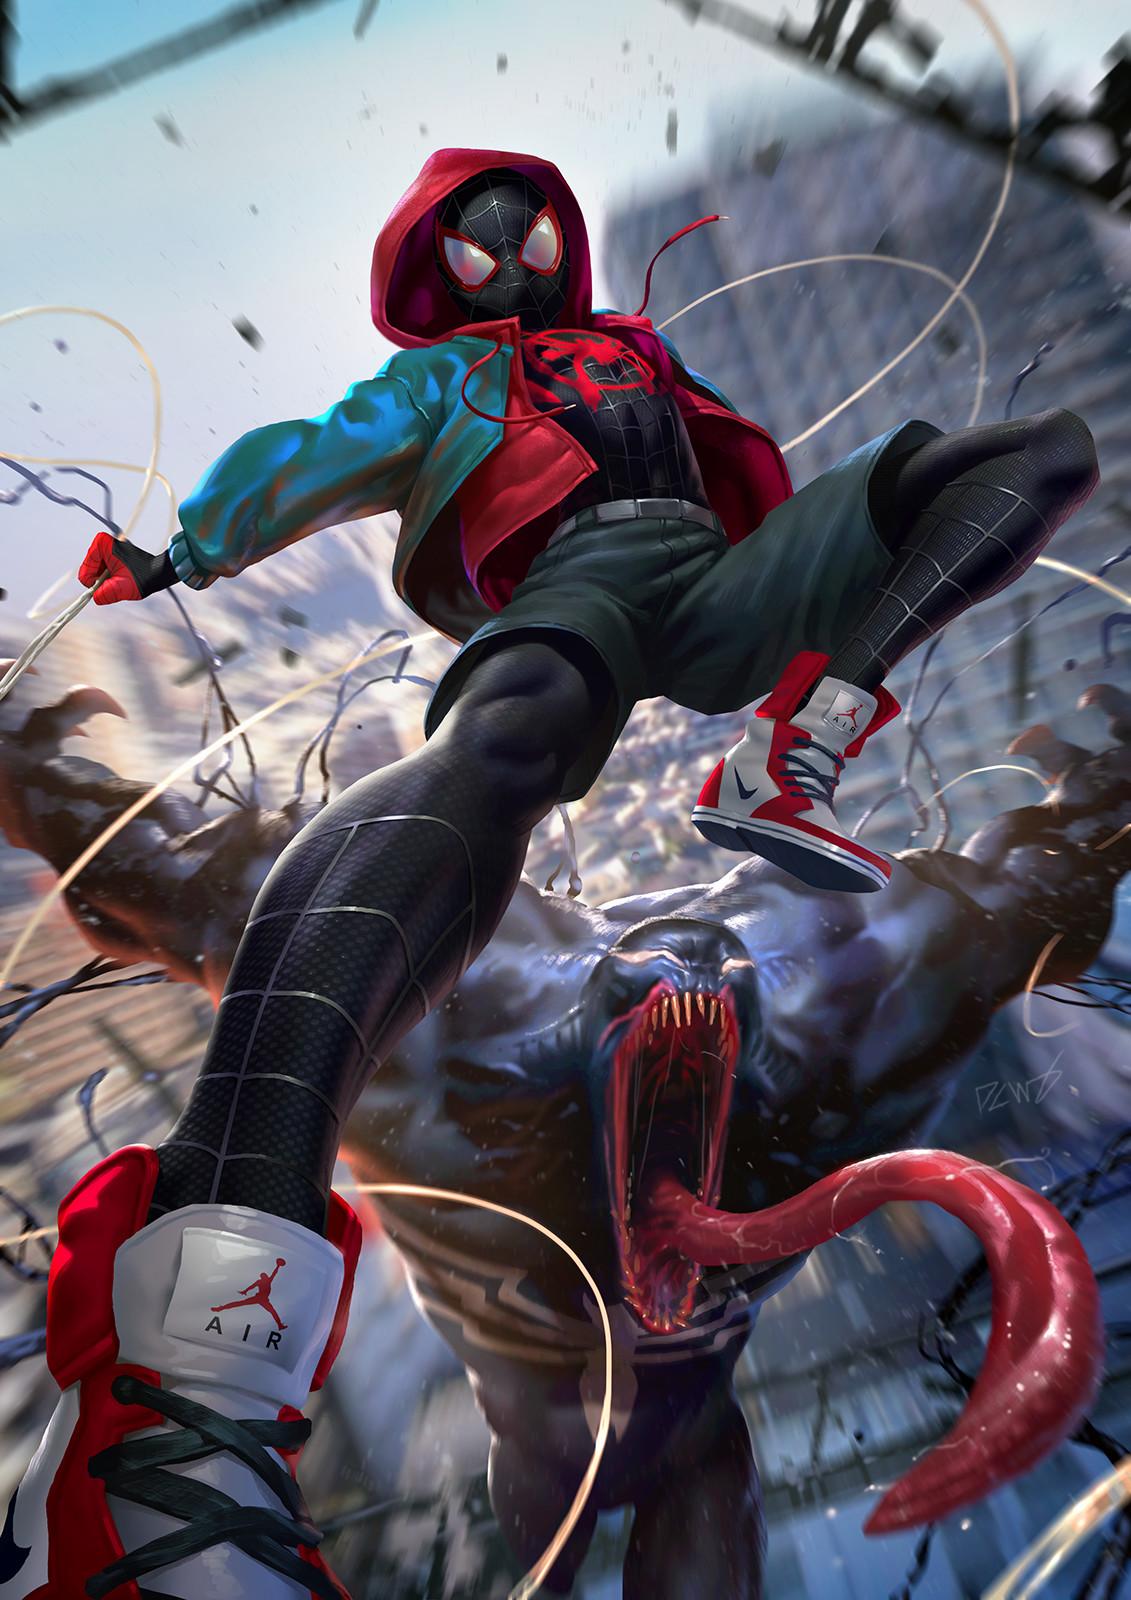 derrick-chew-spiderman-nologo-copy.jpg